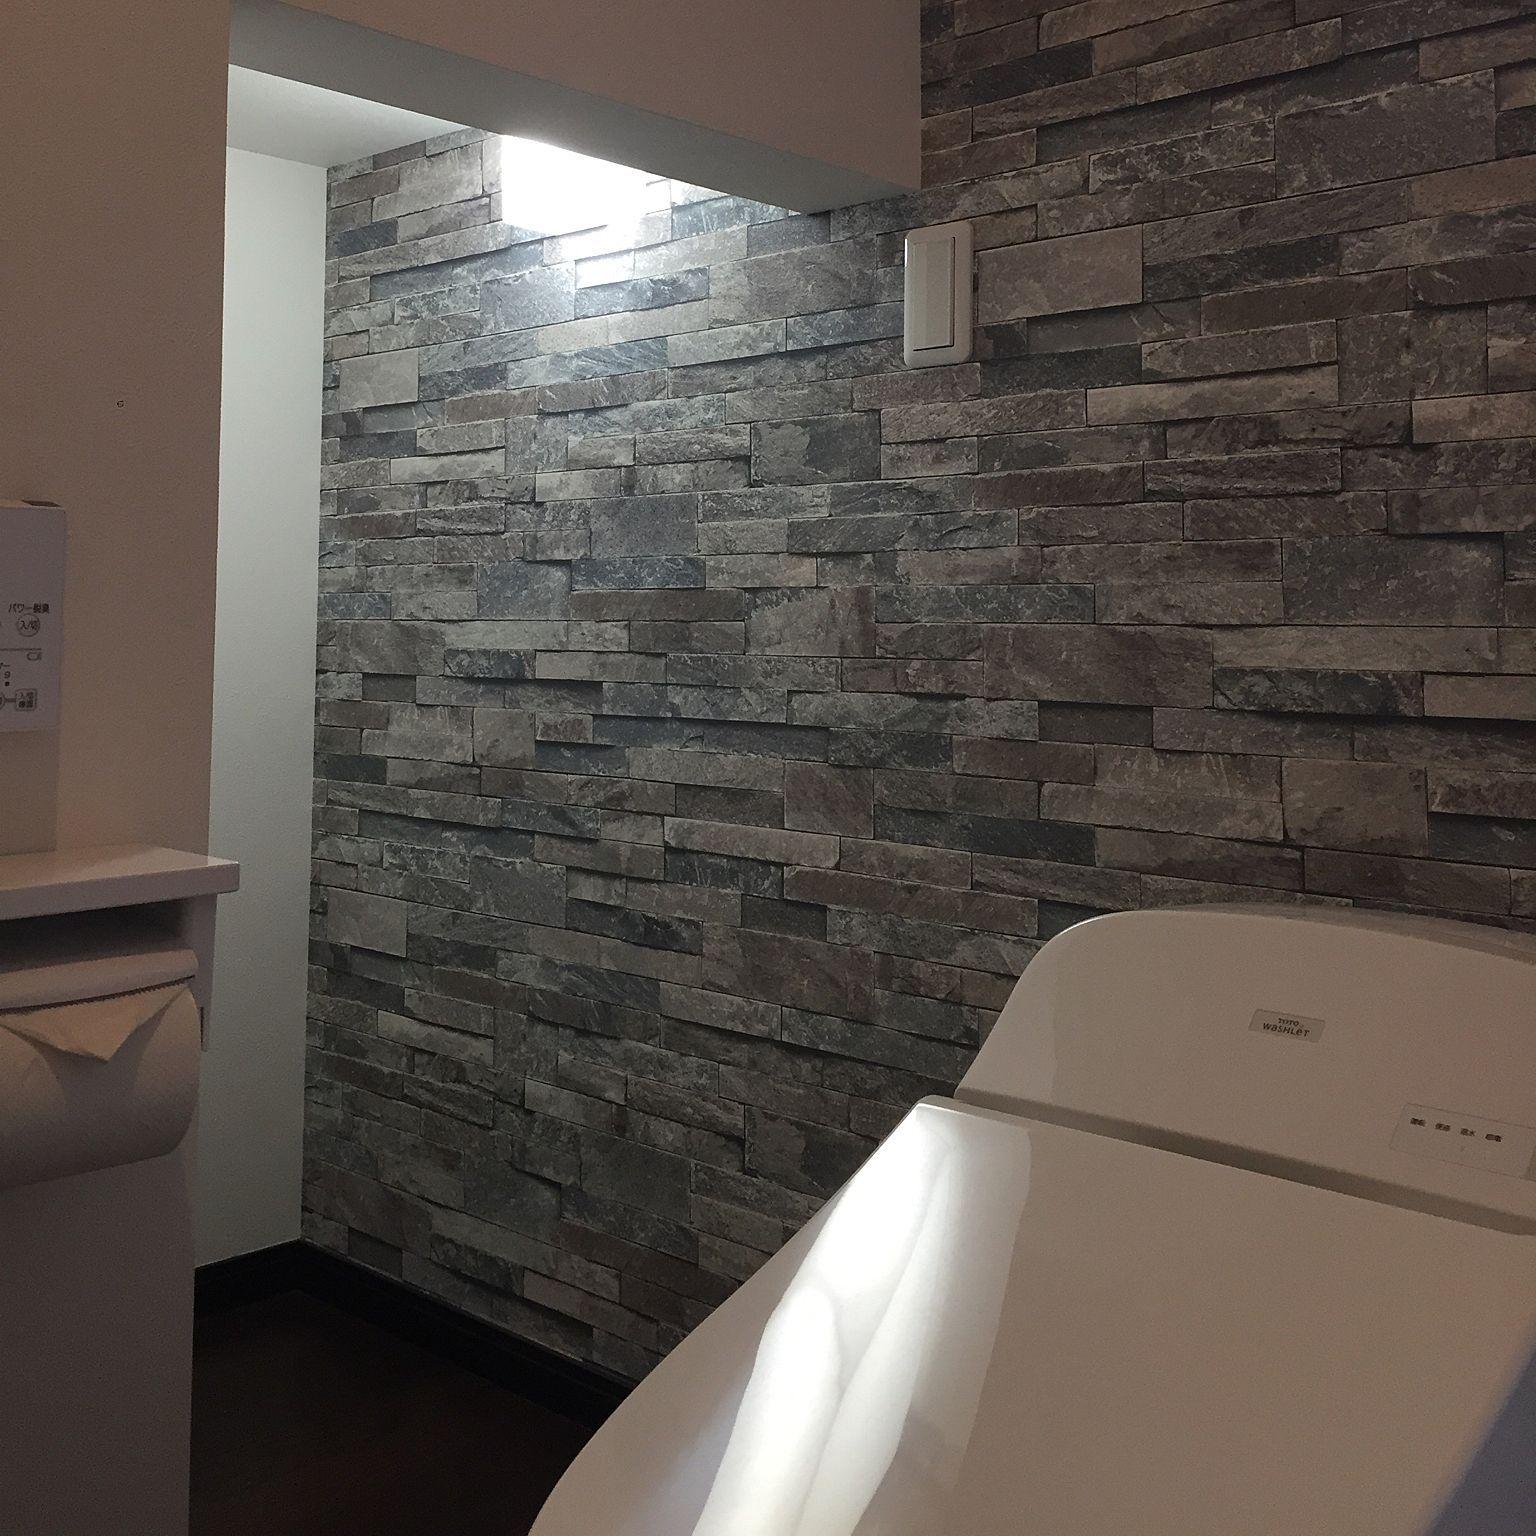 Bathroom 照明 アクセントクロス Toto サンゲツ トイレ 壁紙のインテリア実例 17 10 09 23 40 30 サンゲツ 壁紙 サンゲツ トイレ 壁紙